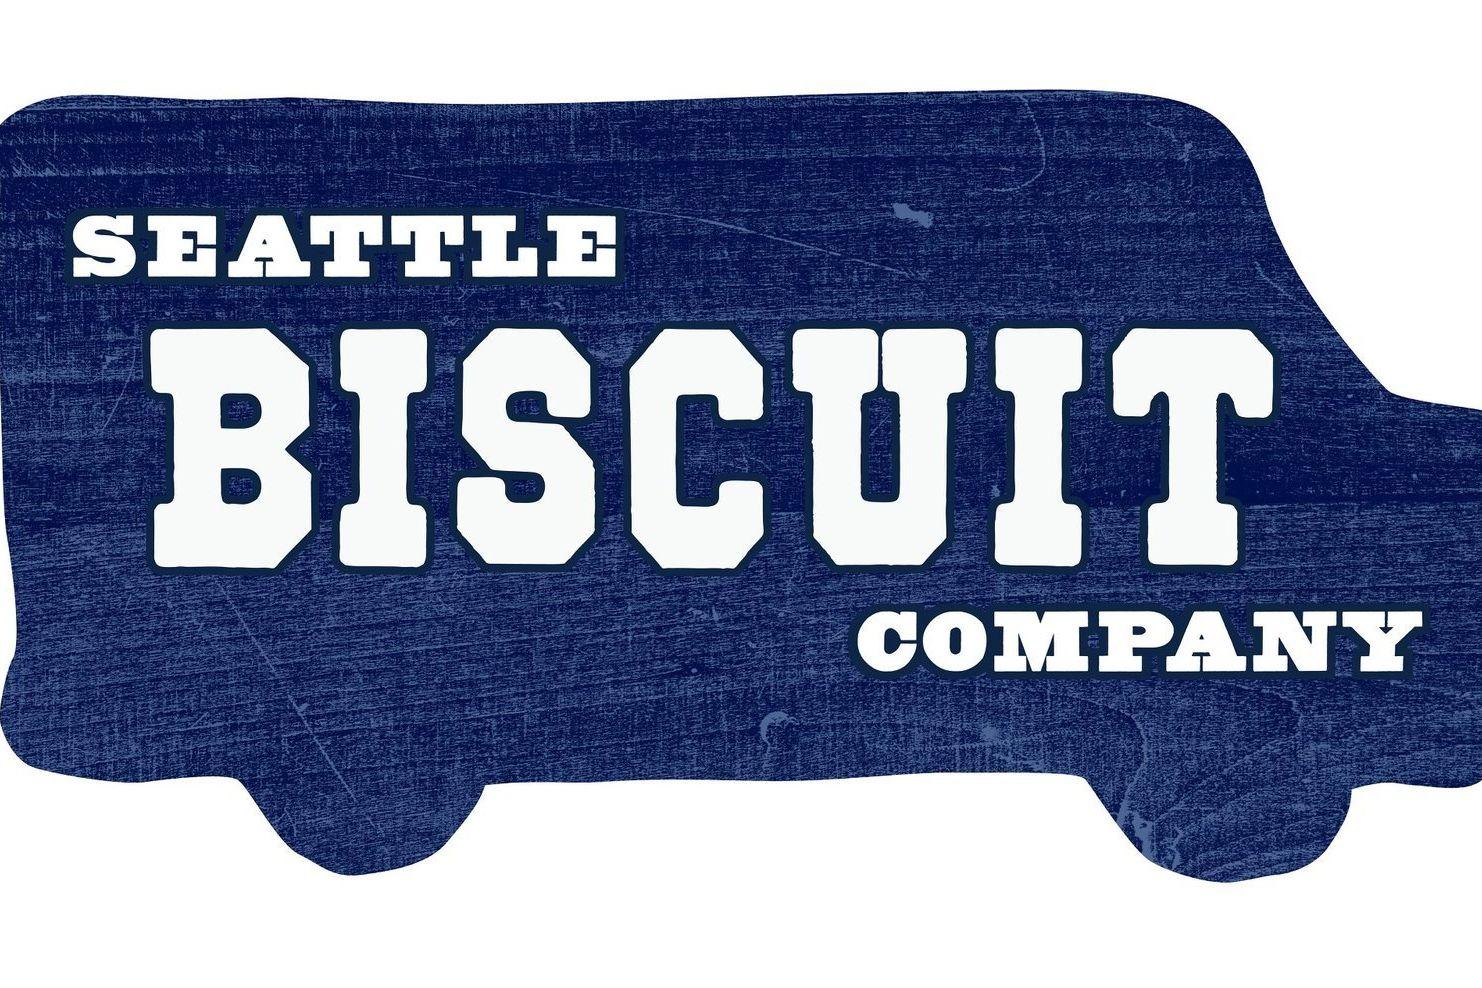 Seattle biscuit company food truck qtjfmk